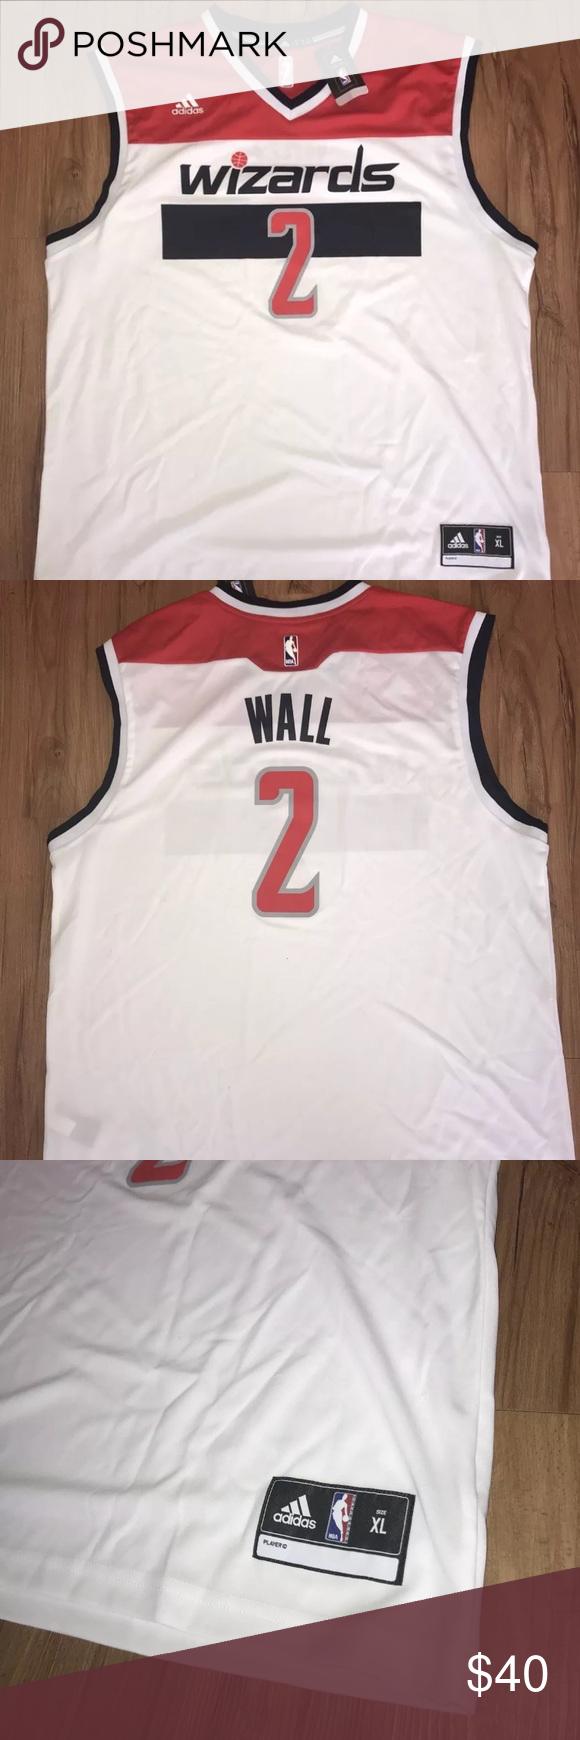 nwt adidas john wall wizards nba jersey mens sz xl new on john wall id=19699